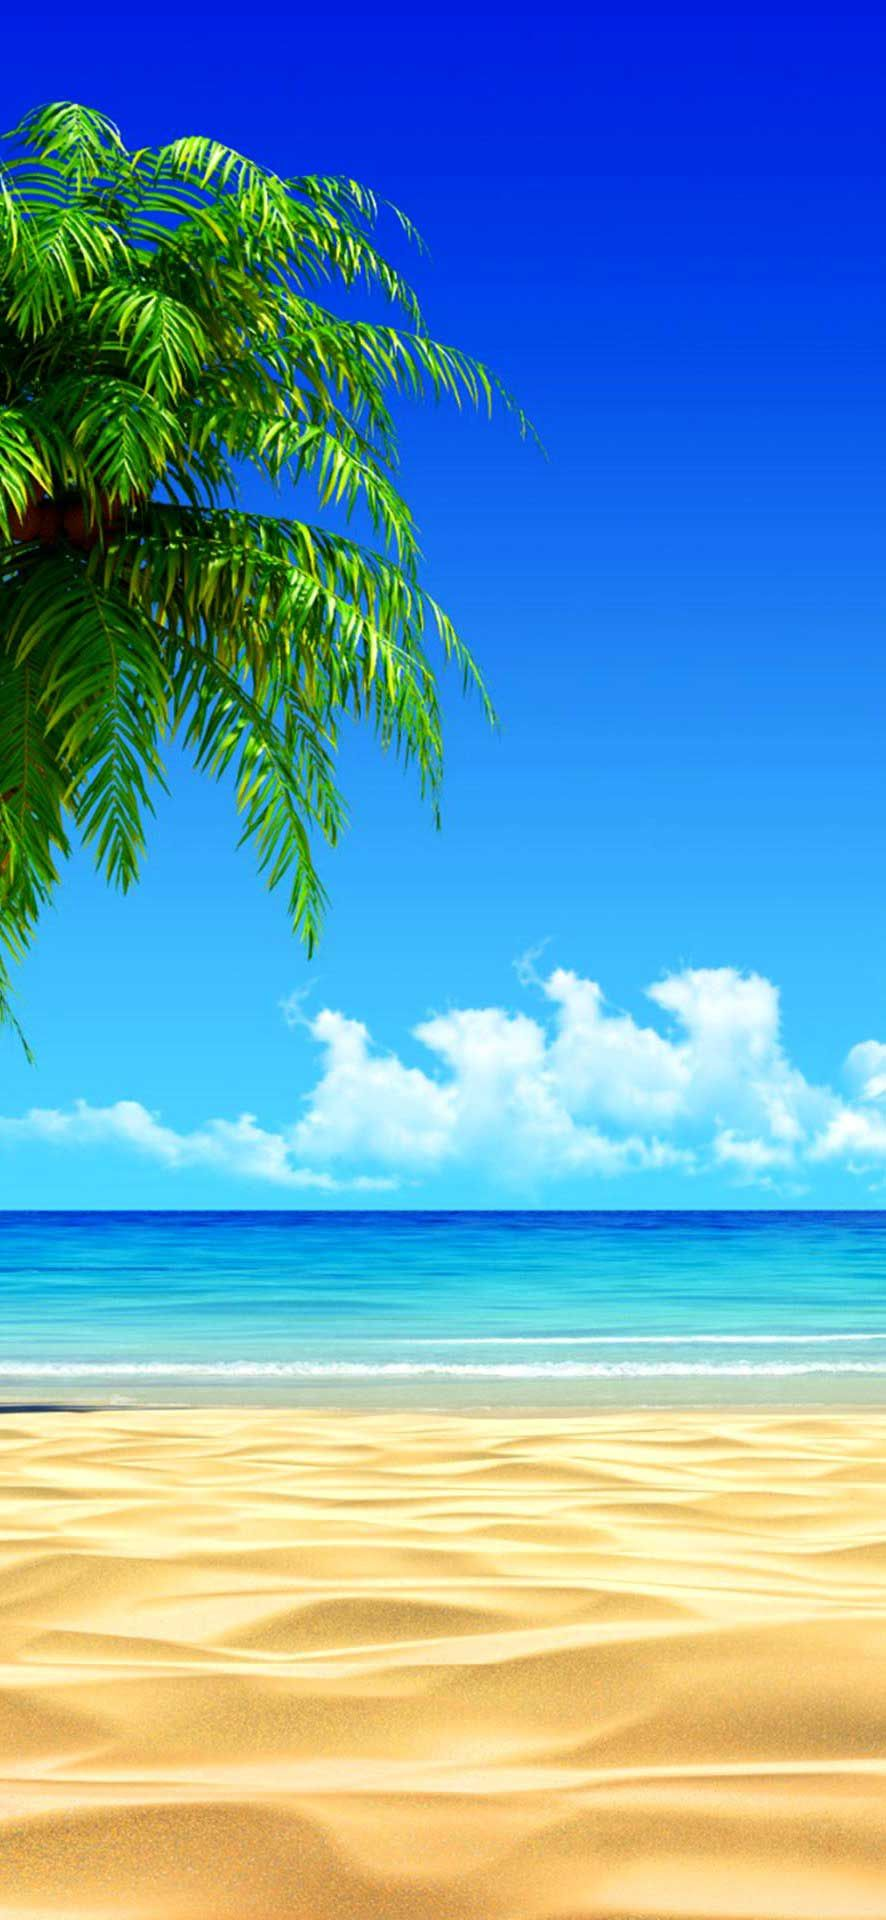 Iphone X Wallpaper Beach House On Tropical Island Hd Wallpaper Beach Hd In 2020 Summer Beach Wallpaper Summer Wallpaper Beach Wallpaper